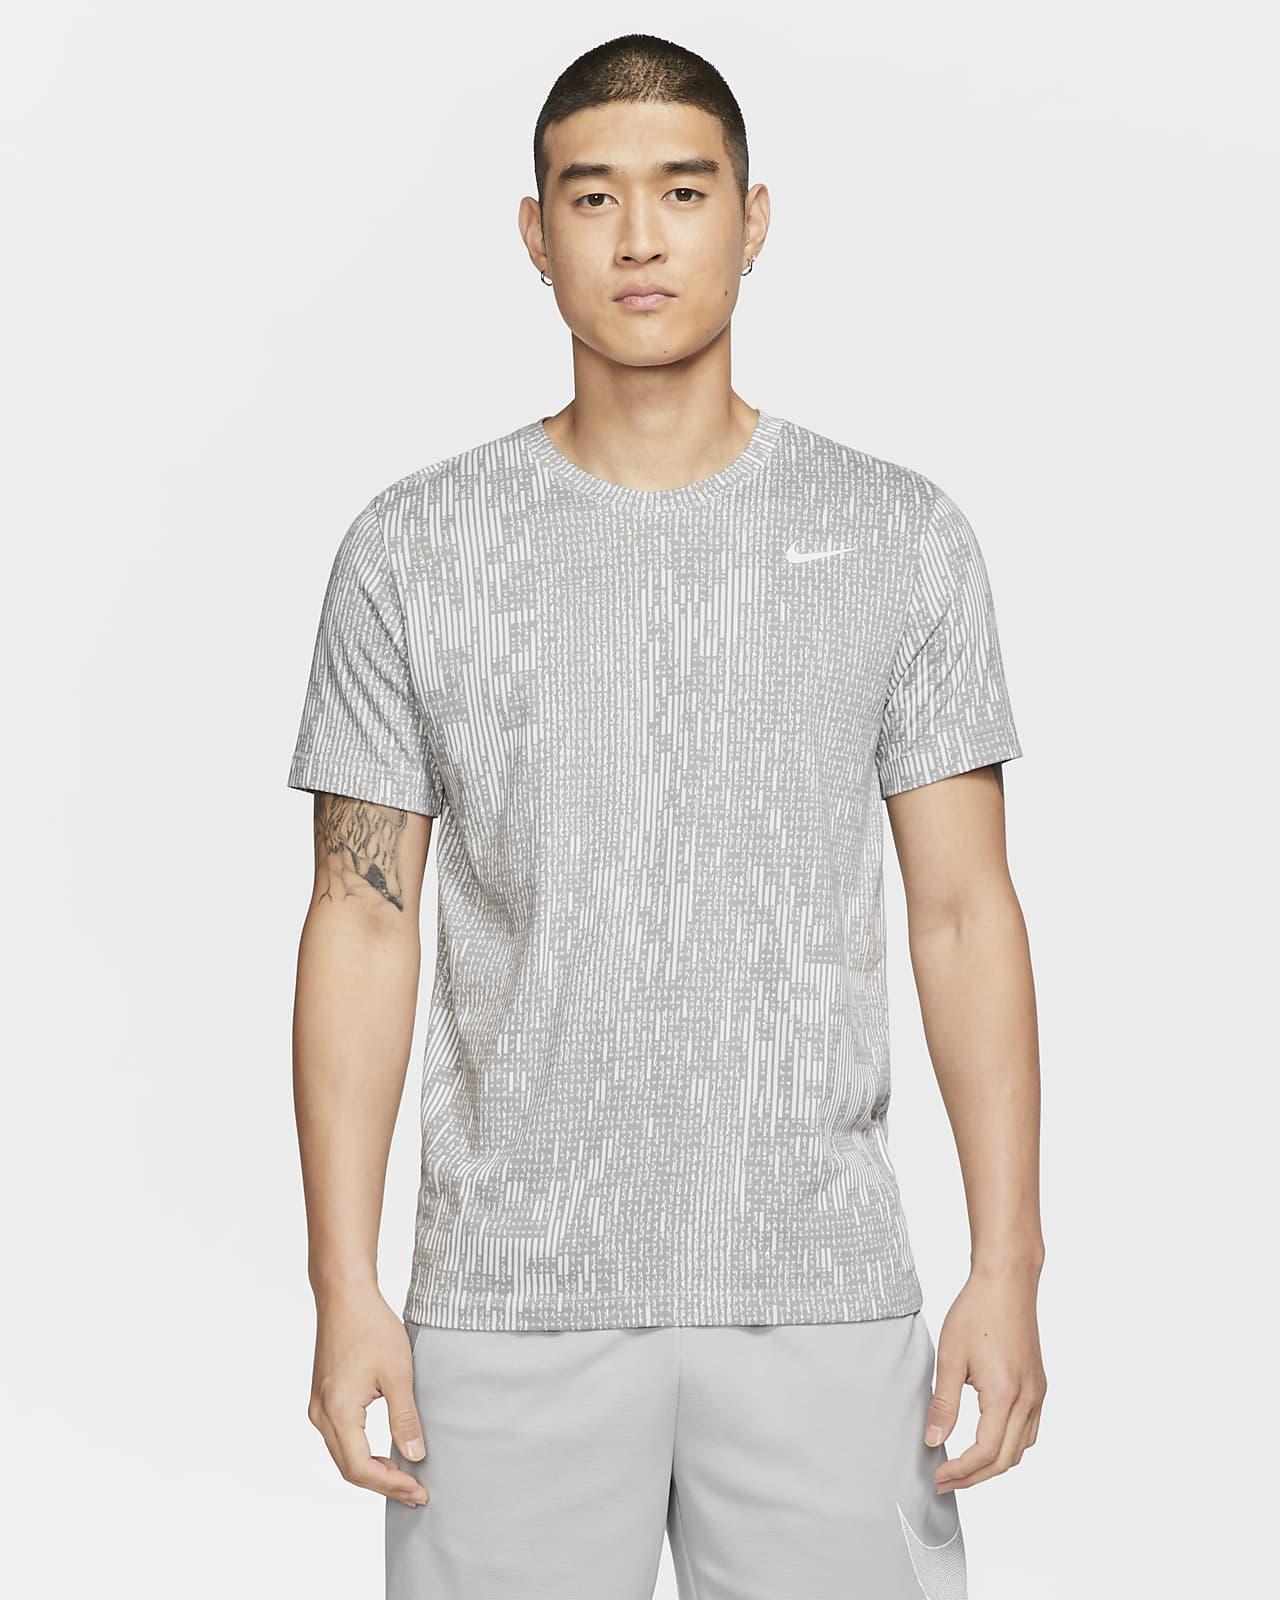 Nike Dri-FIT Men's Printed Training T-Shirt